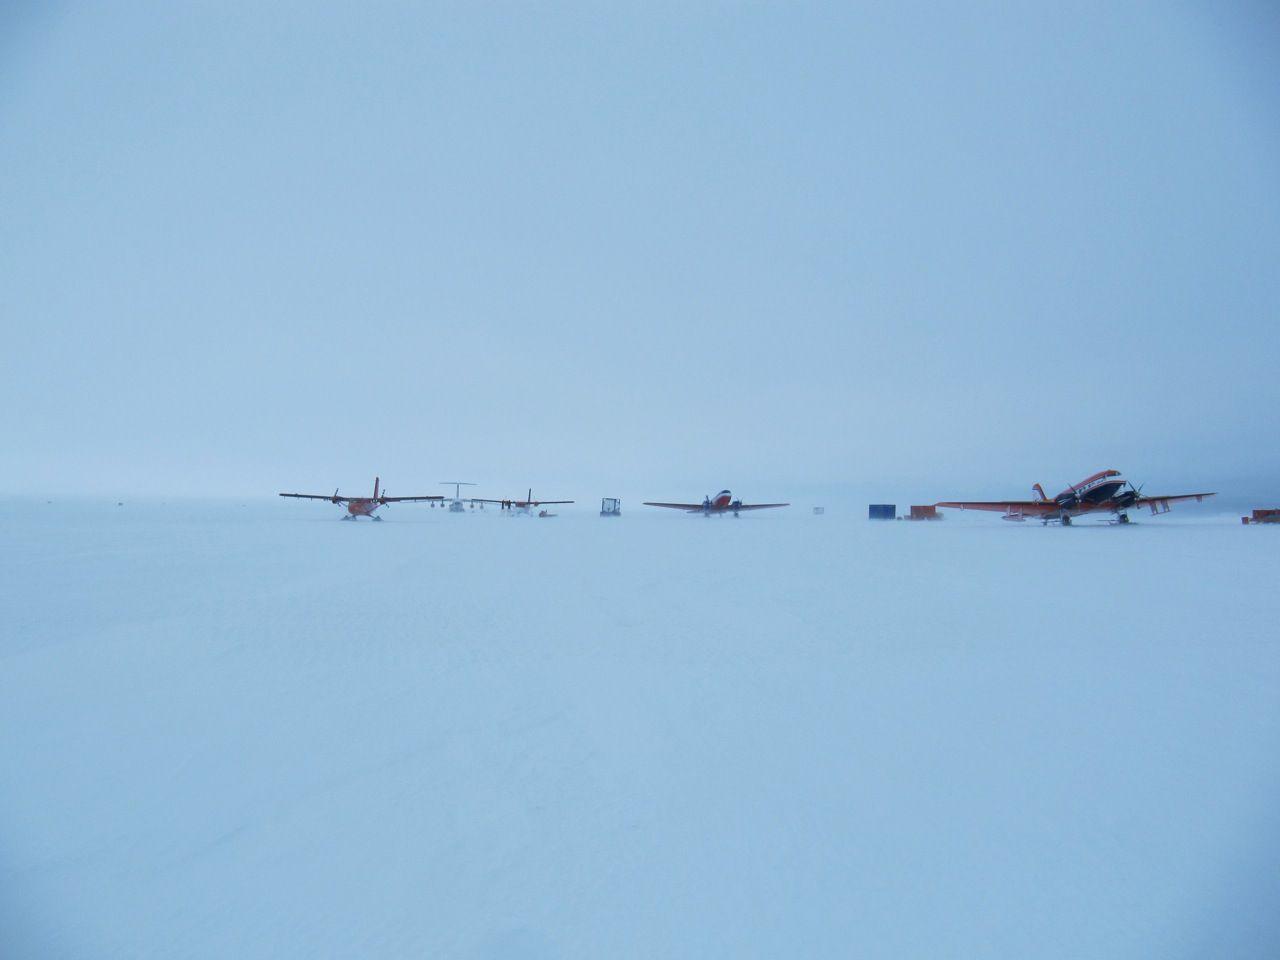 Novo Runway Novolazarevskaya Base Antarctica RI1ANR DX News